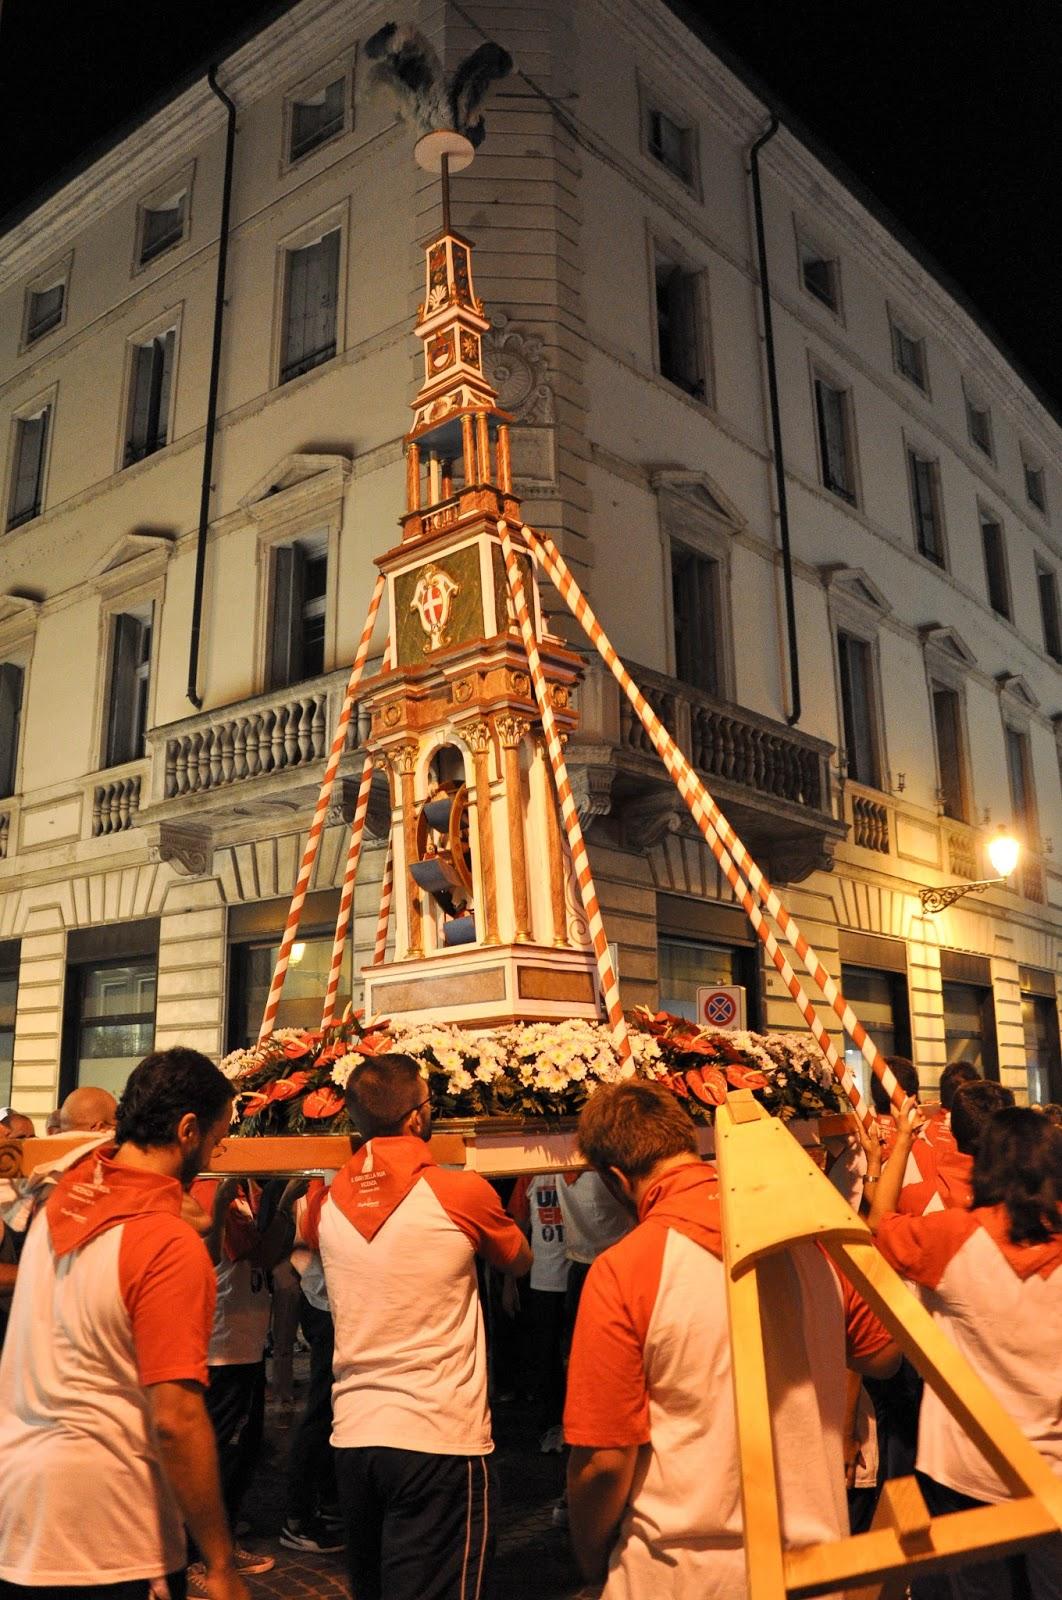 The parade with Giro della Rua going up Corso Palladio, Vicenza, Italy